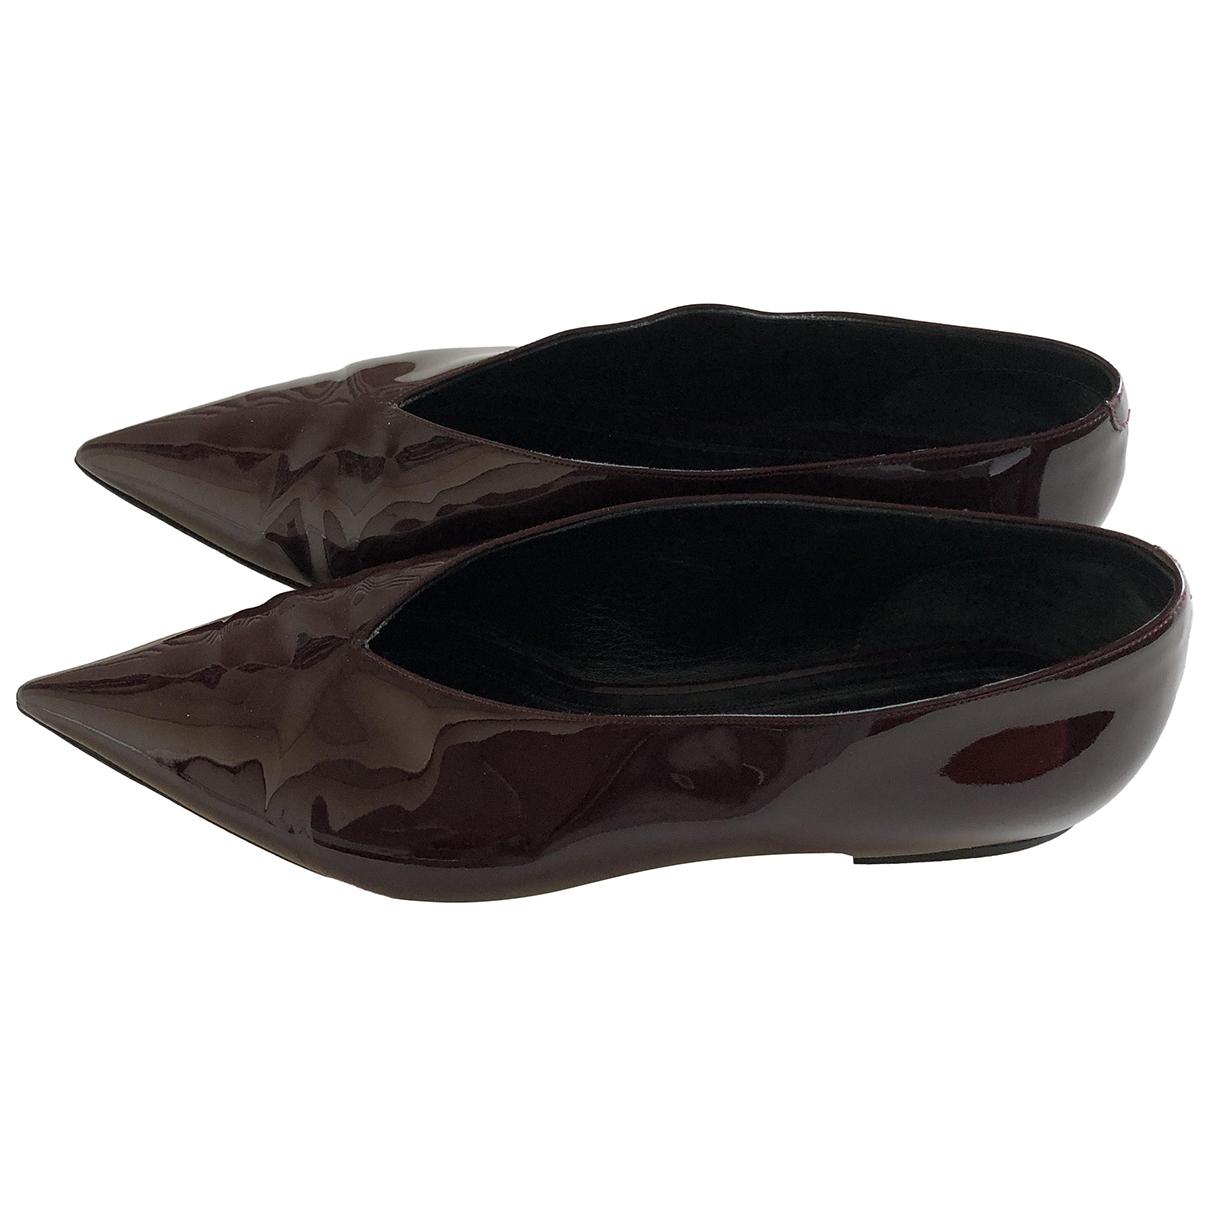 Celine N Burgundy Patent leather Flats for Women 38 EU